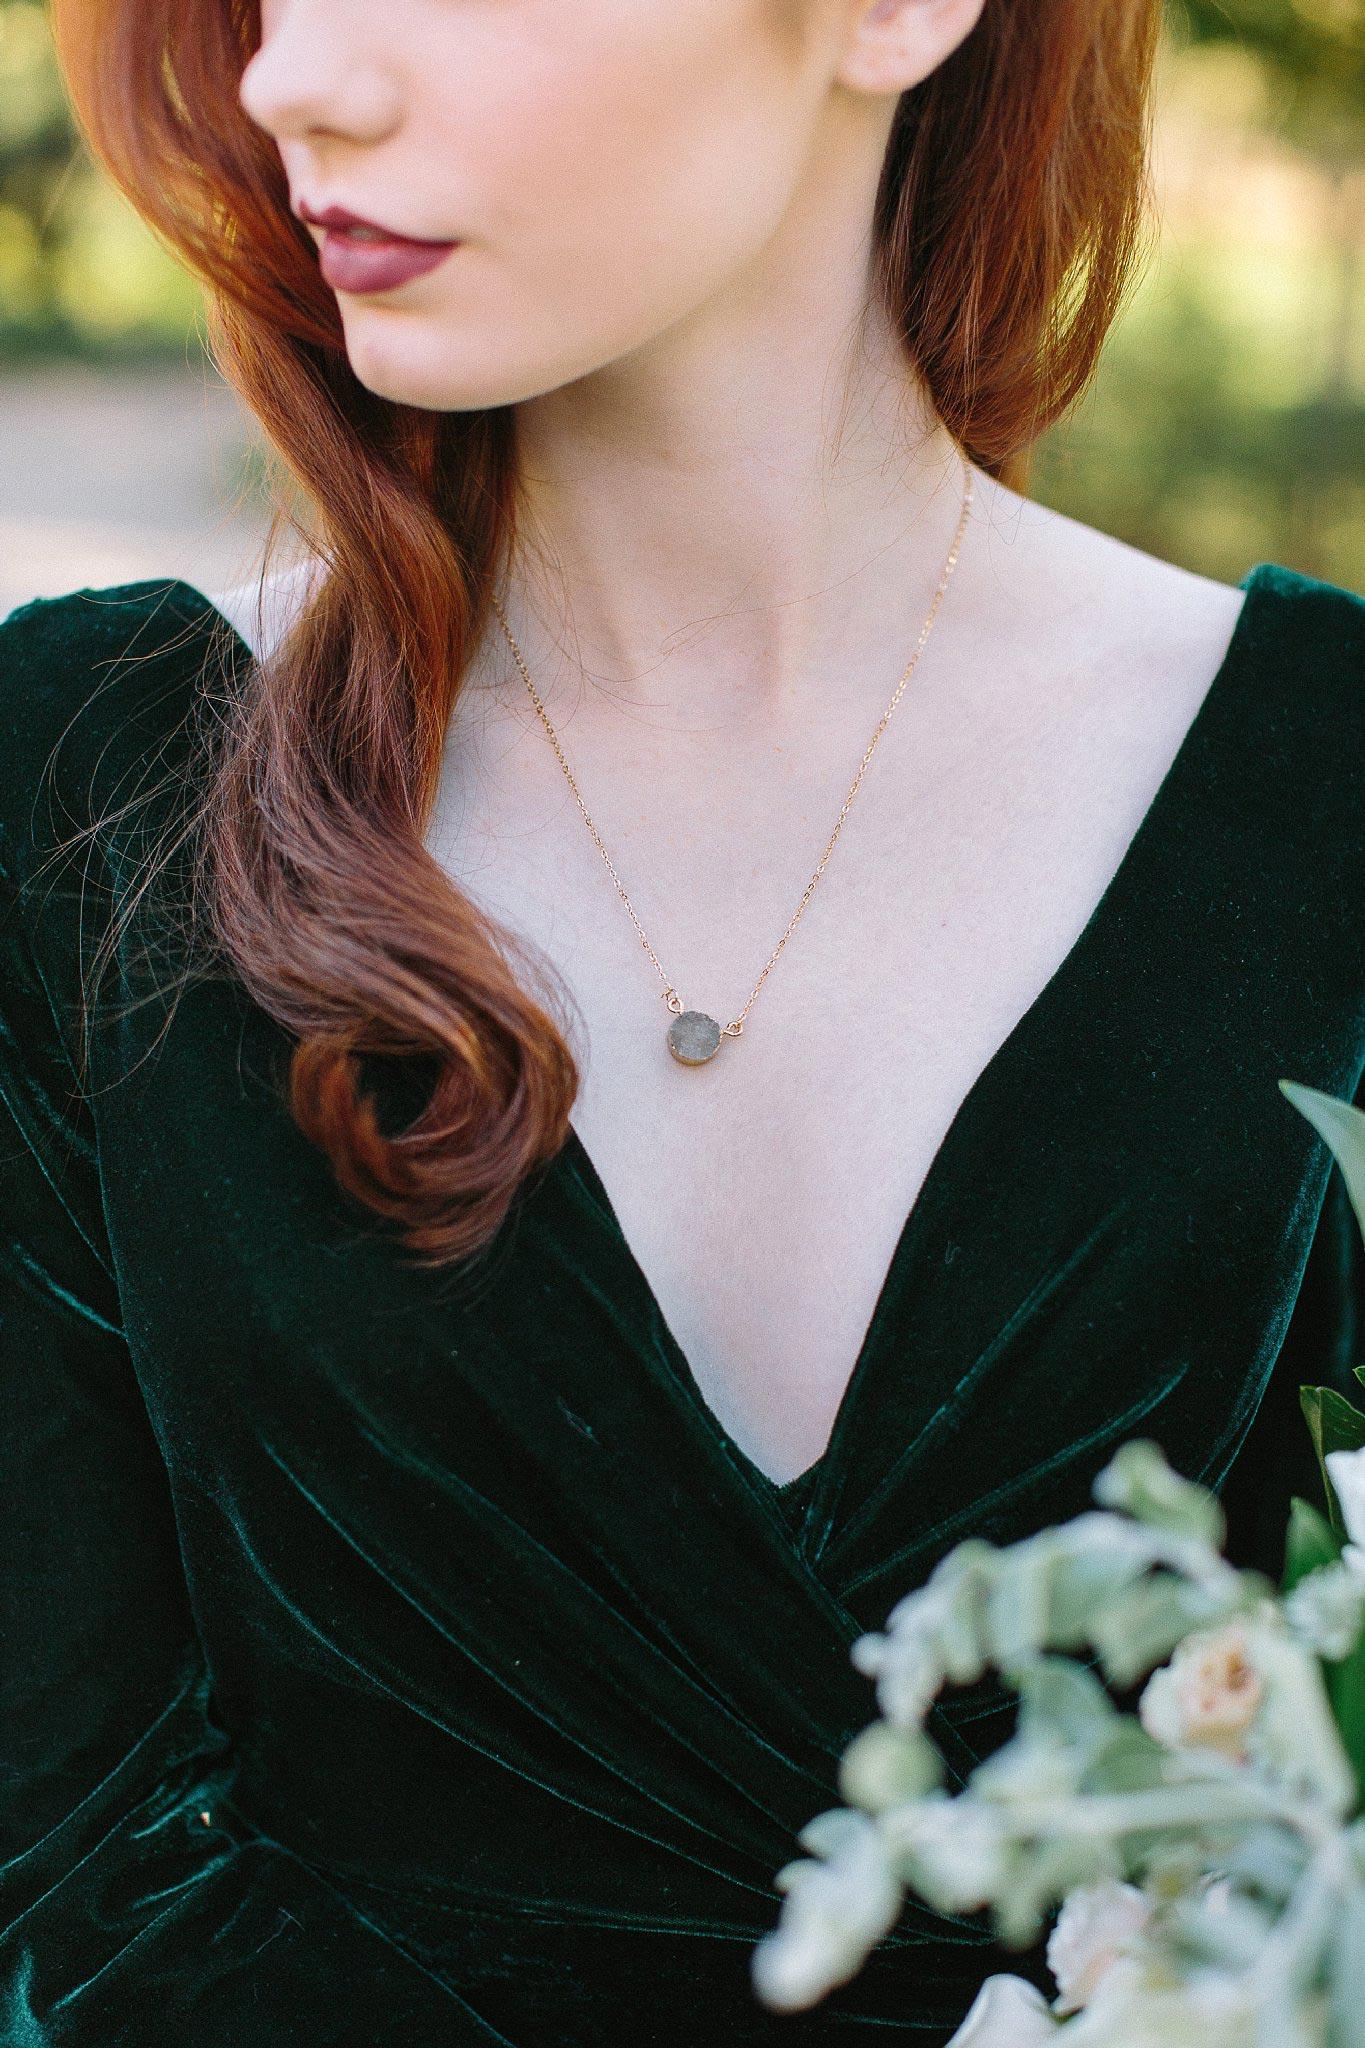 aristide mansfield wedding greenery dress with jewel necklace